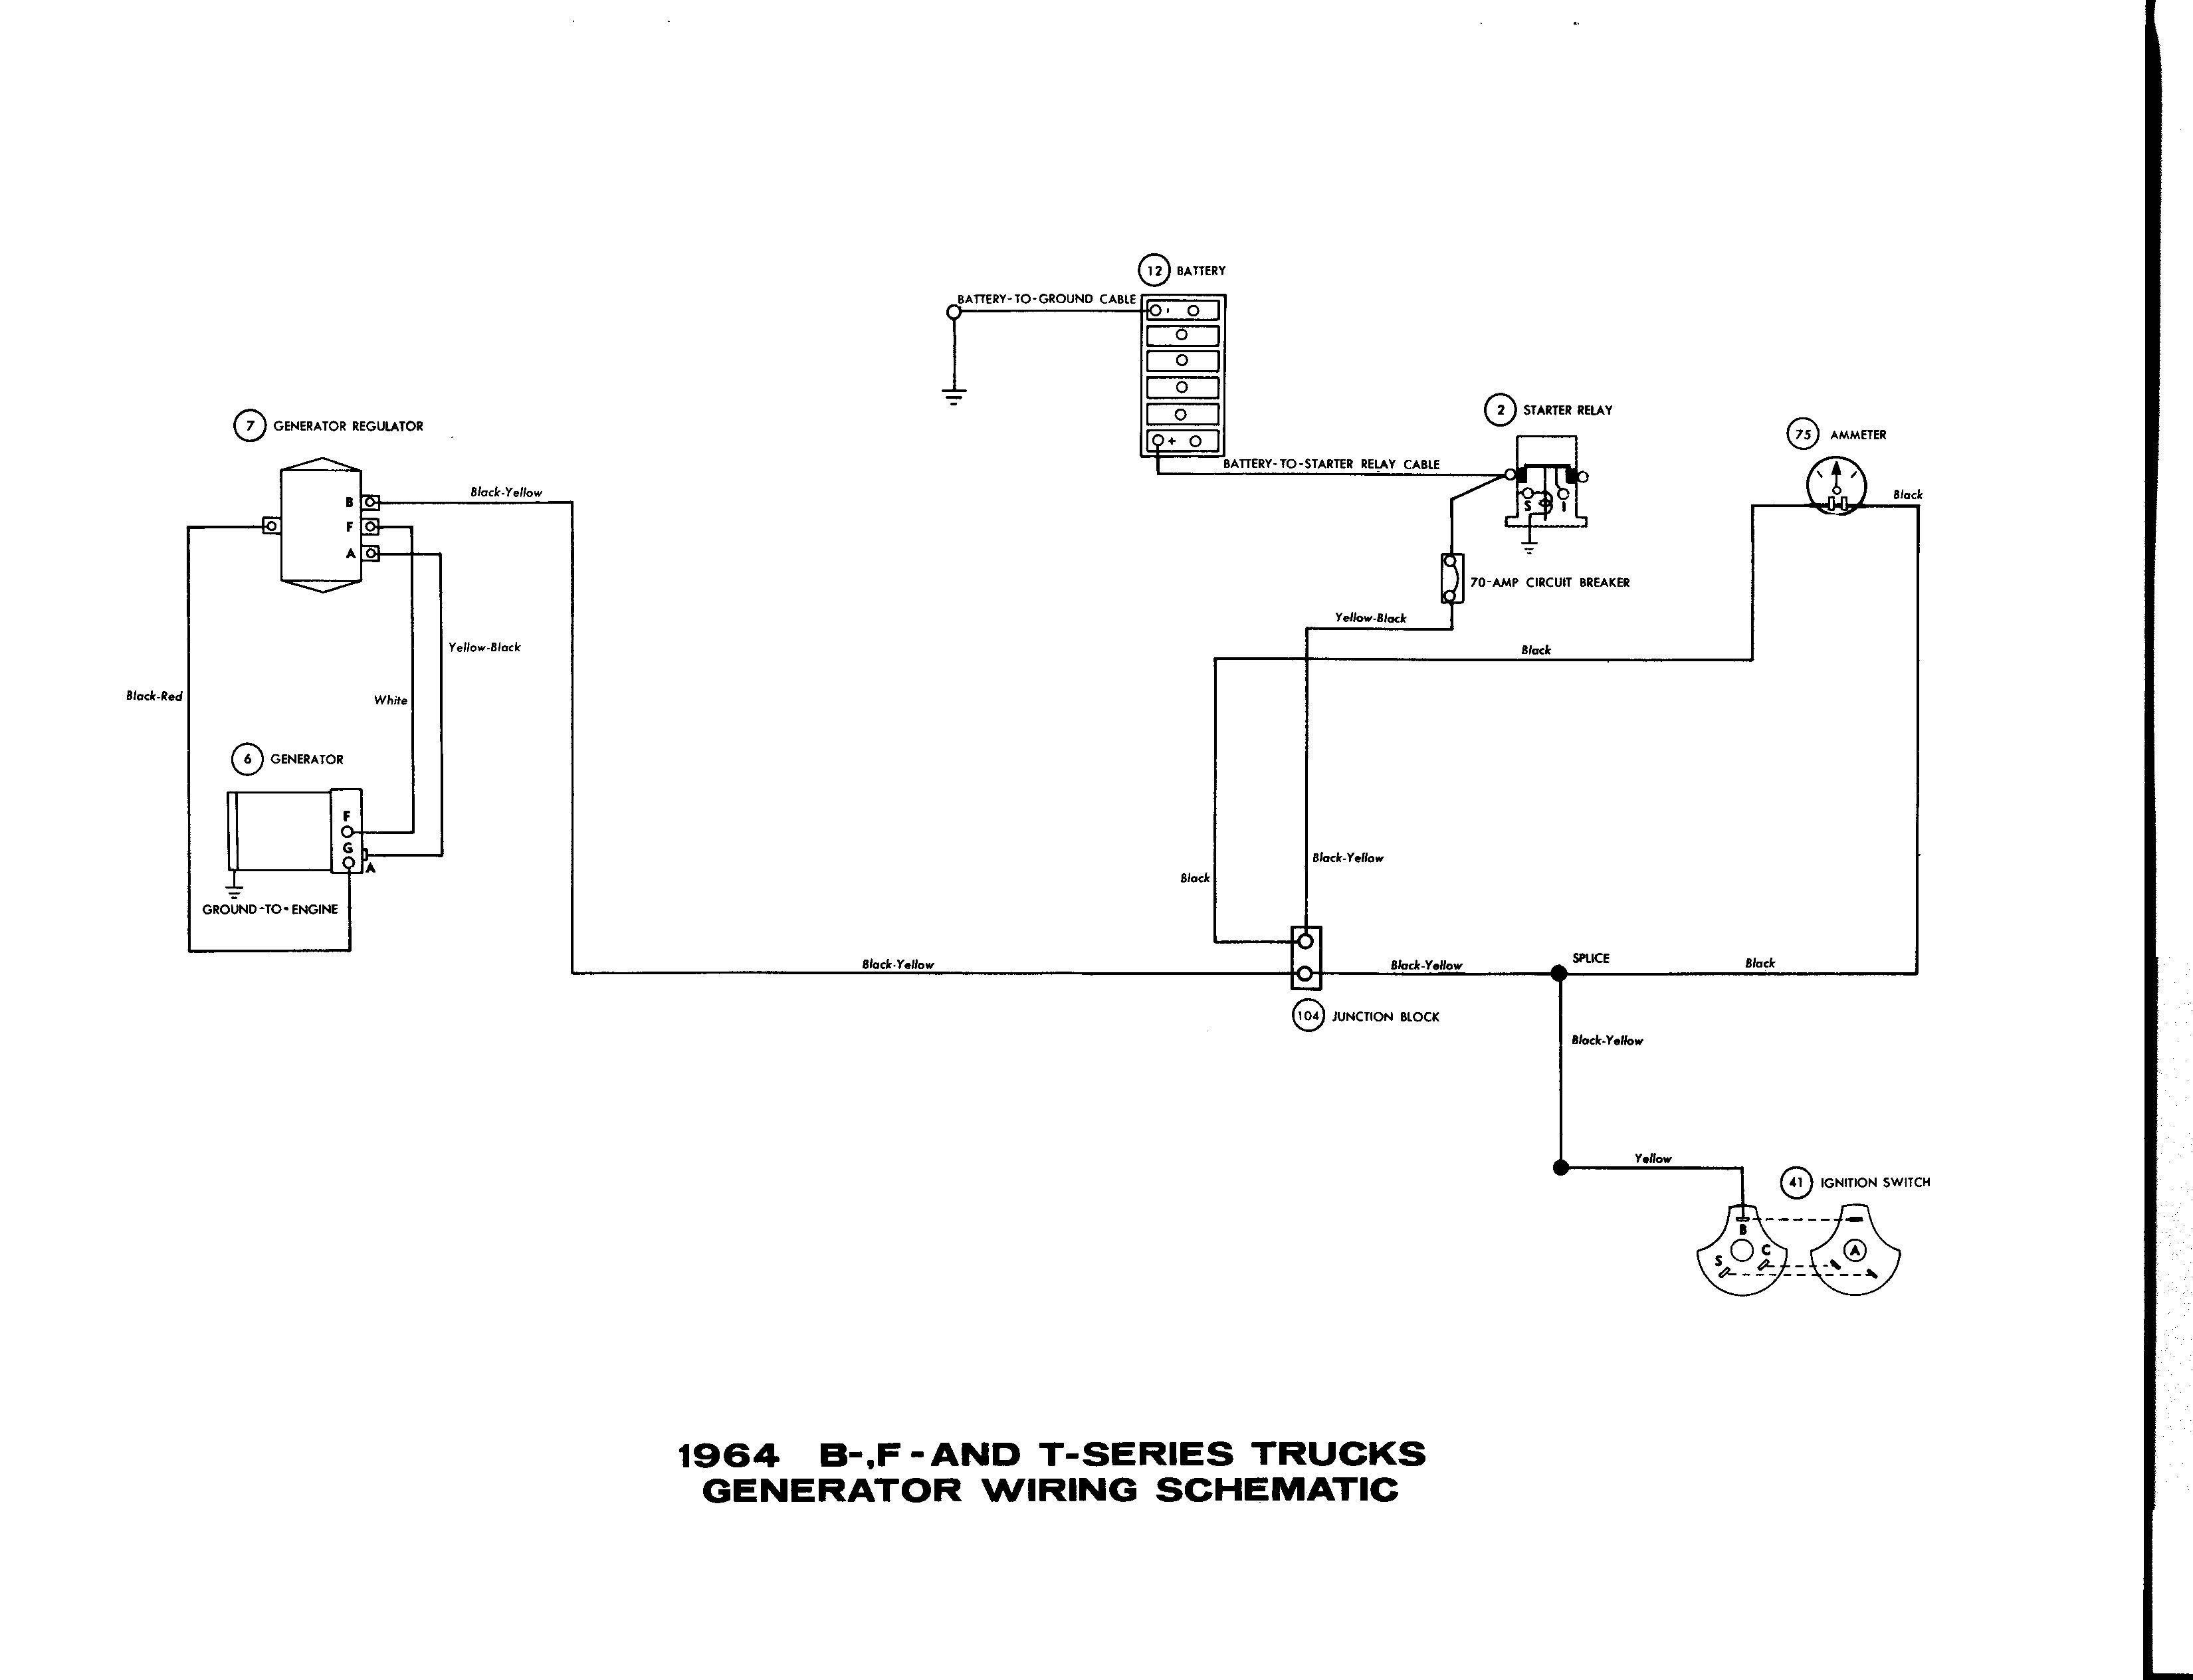 opel alternator wiring diagram - wiring diagram today on isuzu npr  battery diagram,